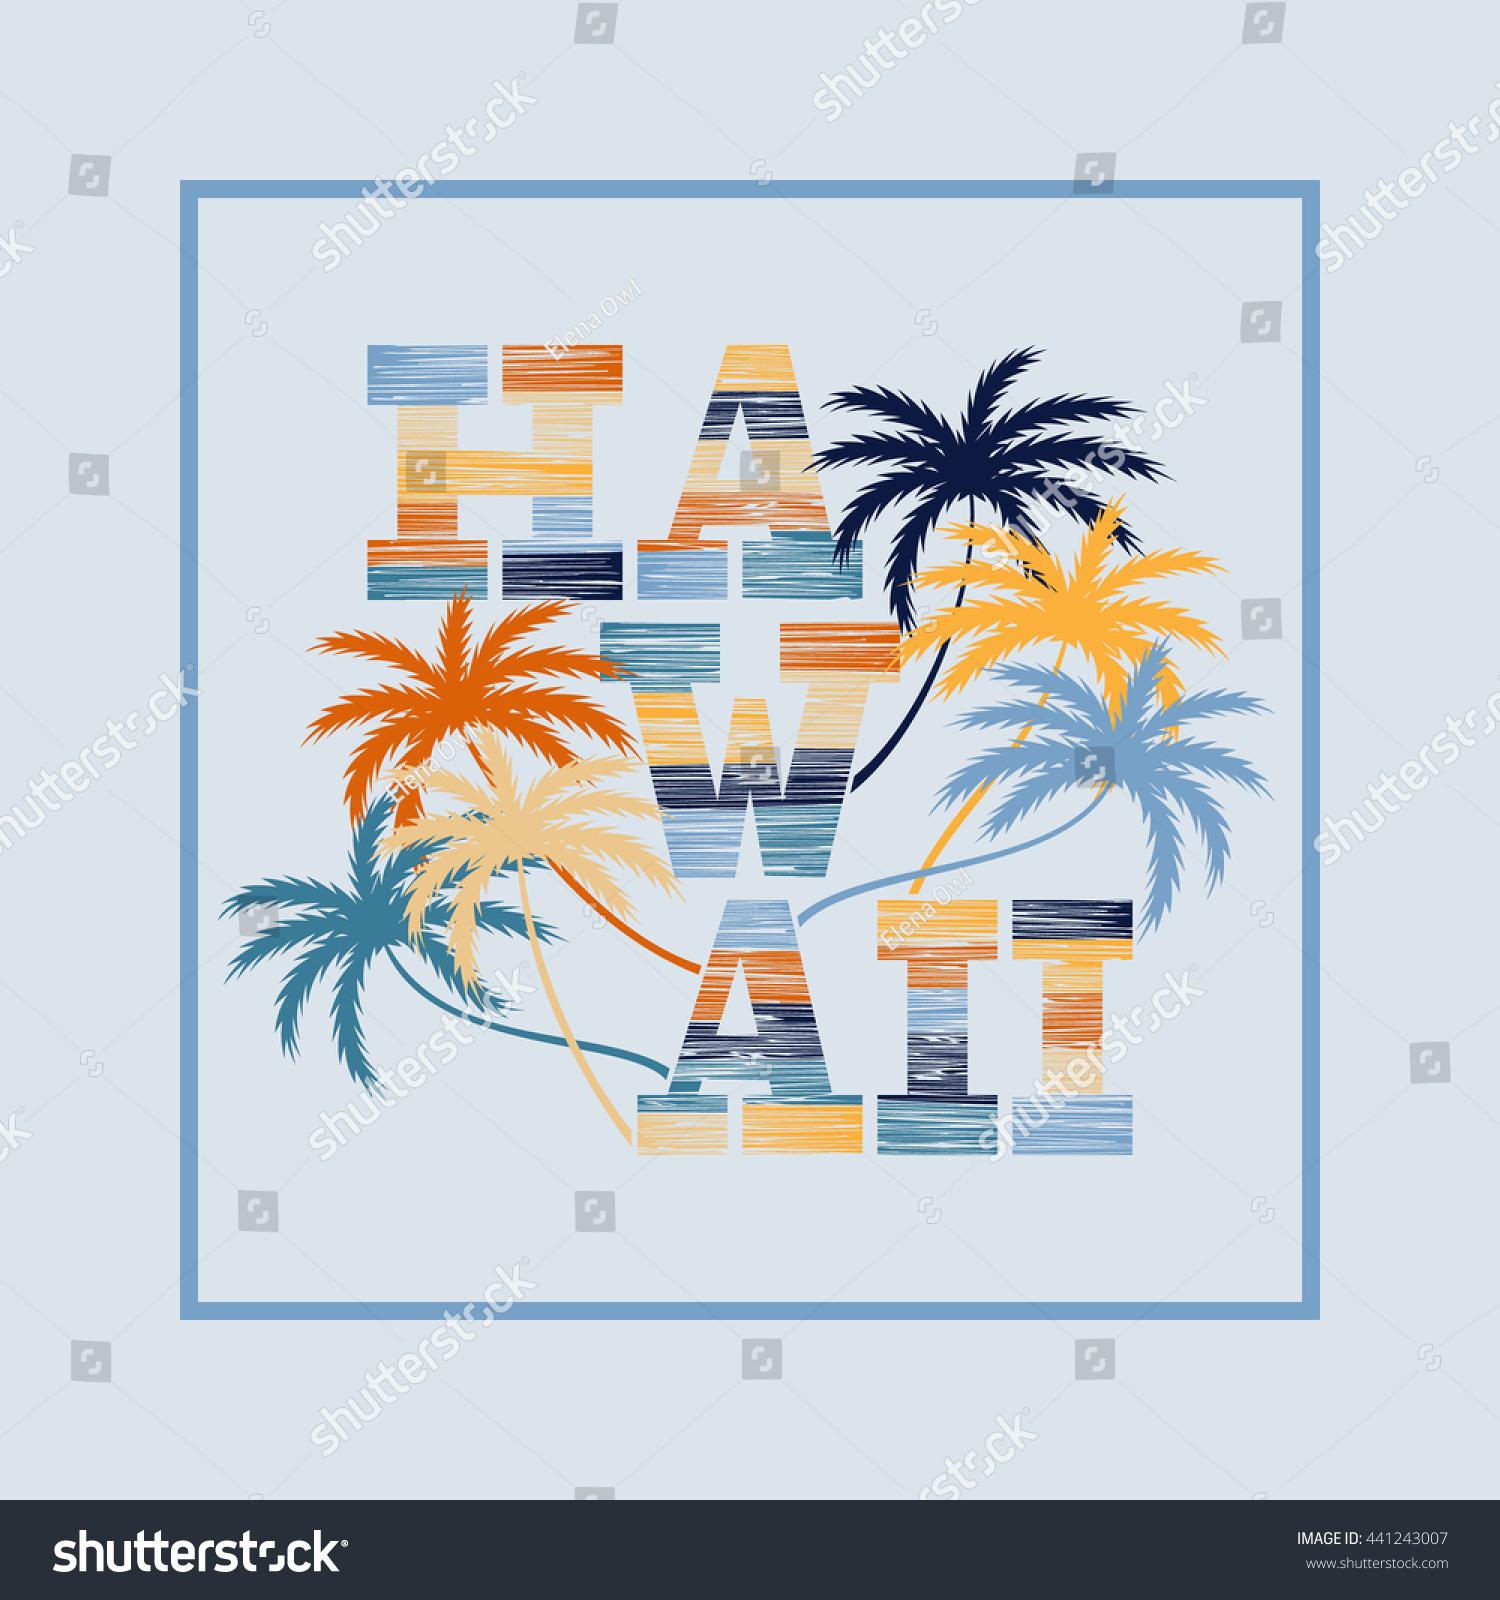 T shirt design hawaii - Save To A Lightbox